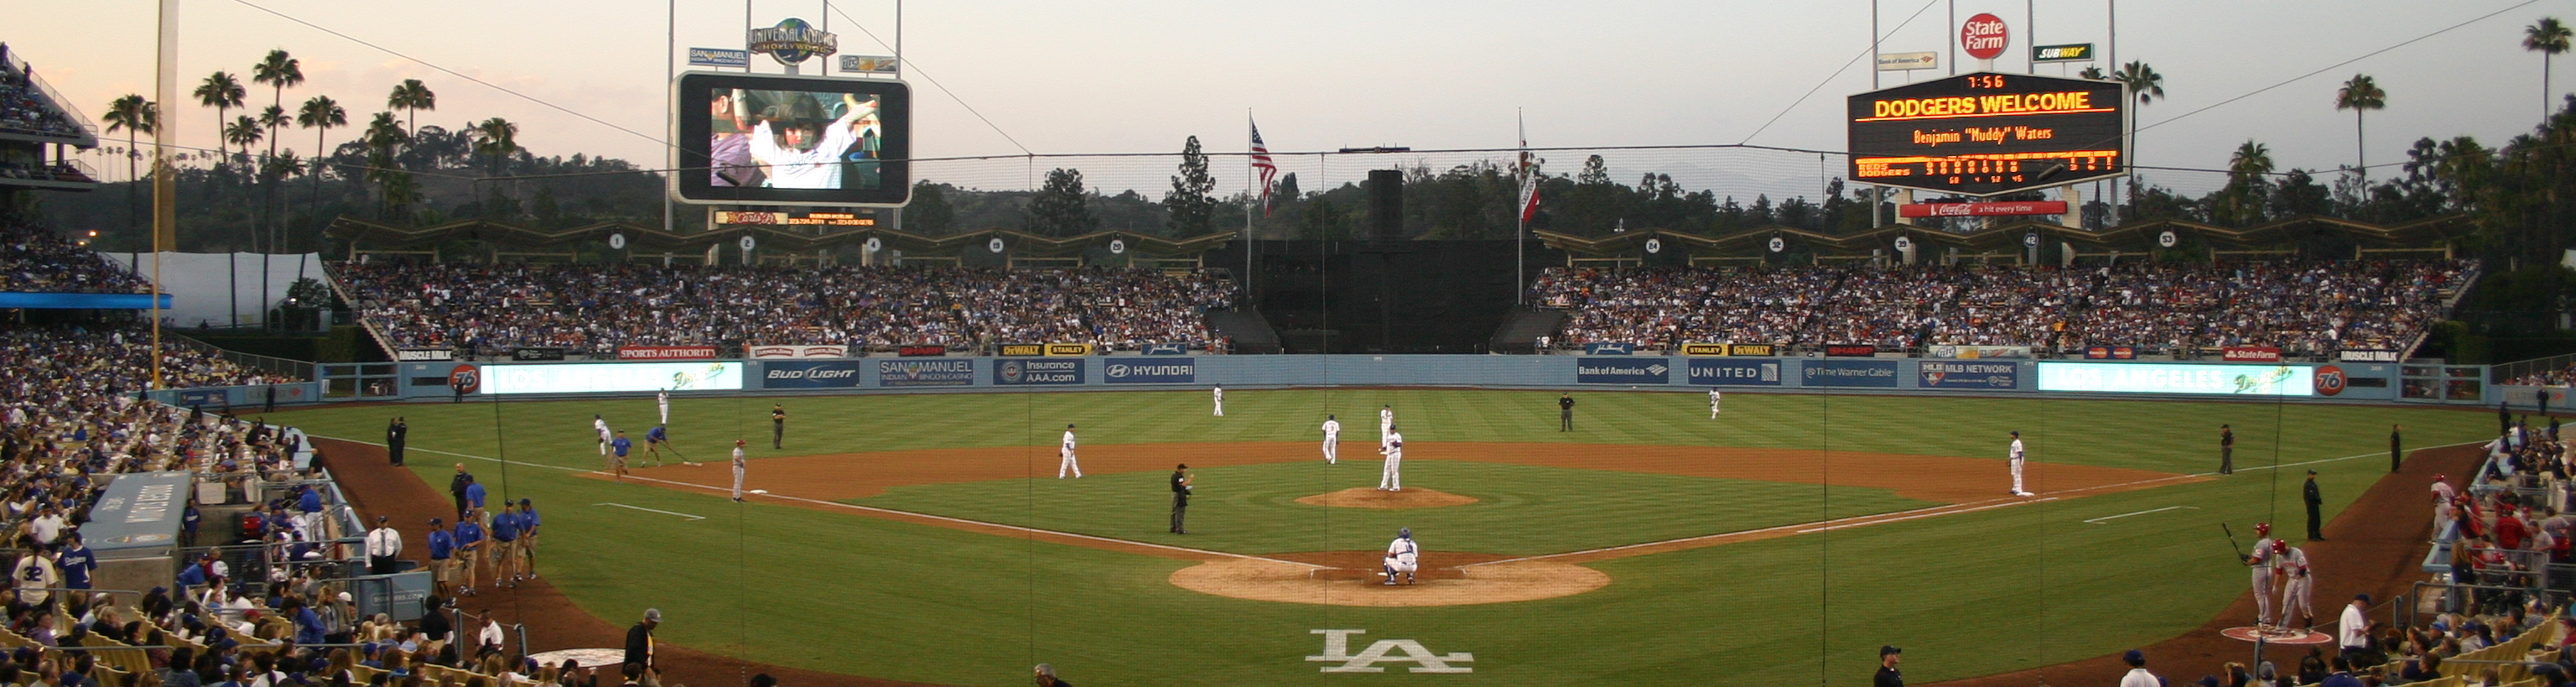 Dodger Stadium,west coast baseball trips,baseball tour packages